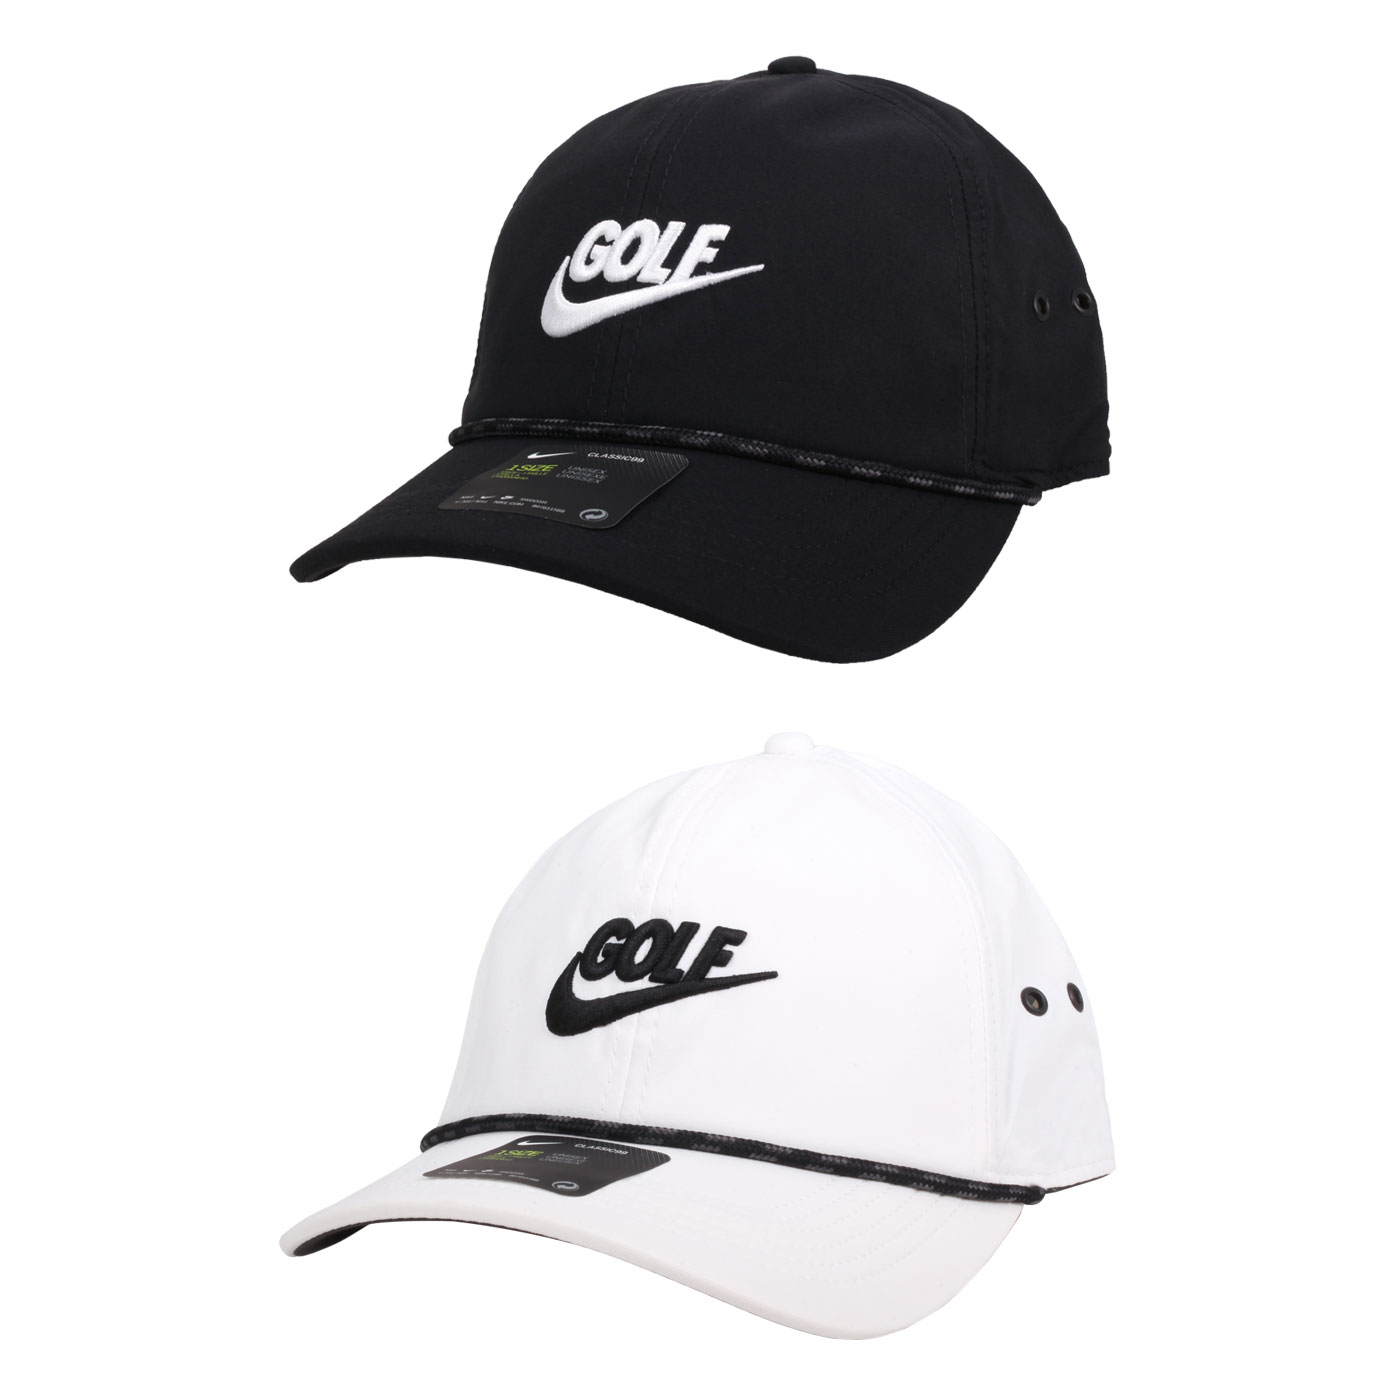 NIKE 高爾夫運動帽  GOLFBV8229-010